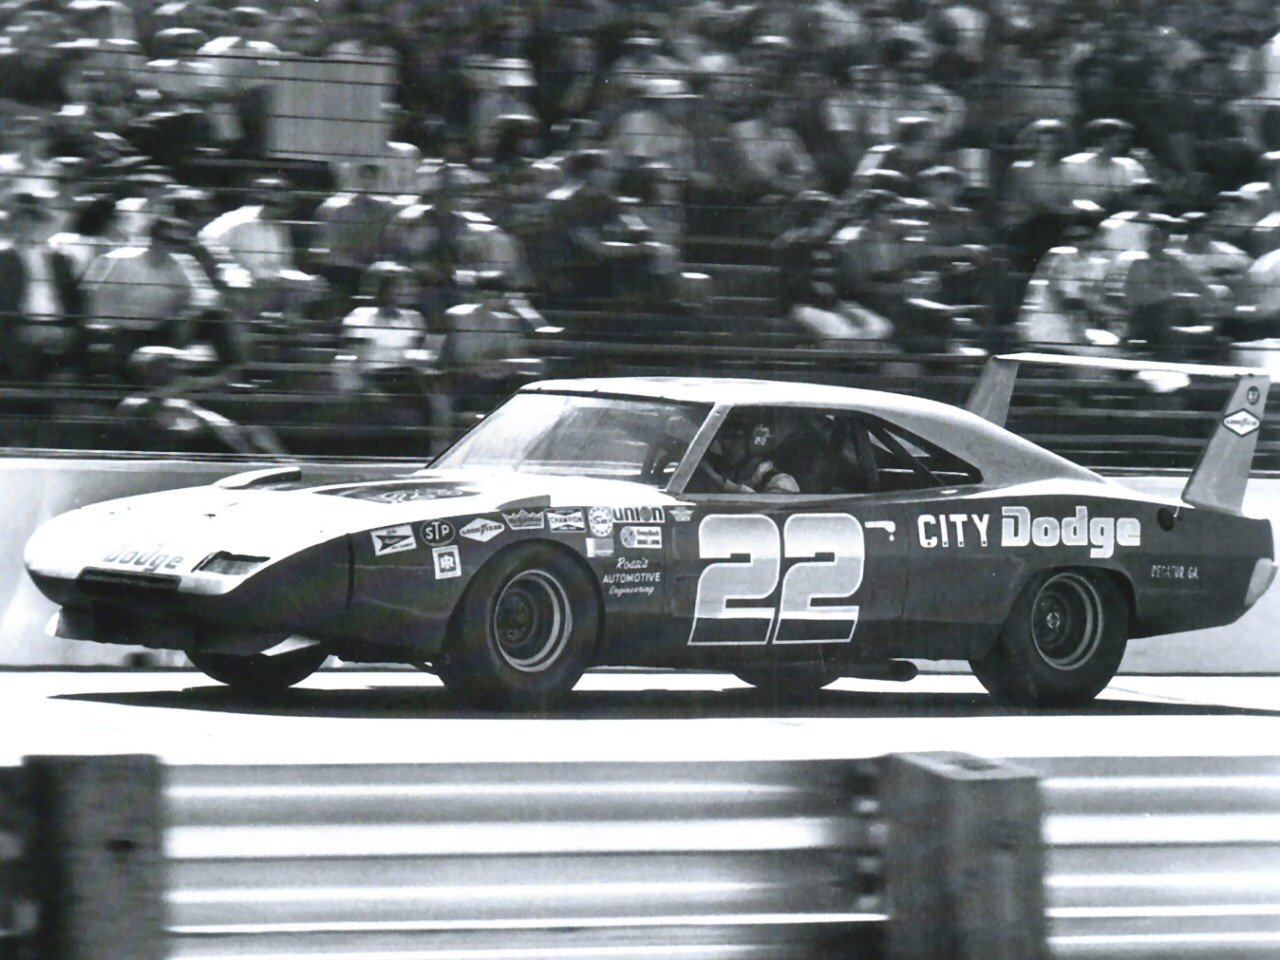 1969 Dodge Charger Daytona Nascar Race Car Bobby Allison S Car Fsv